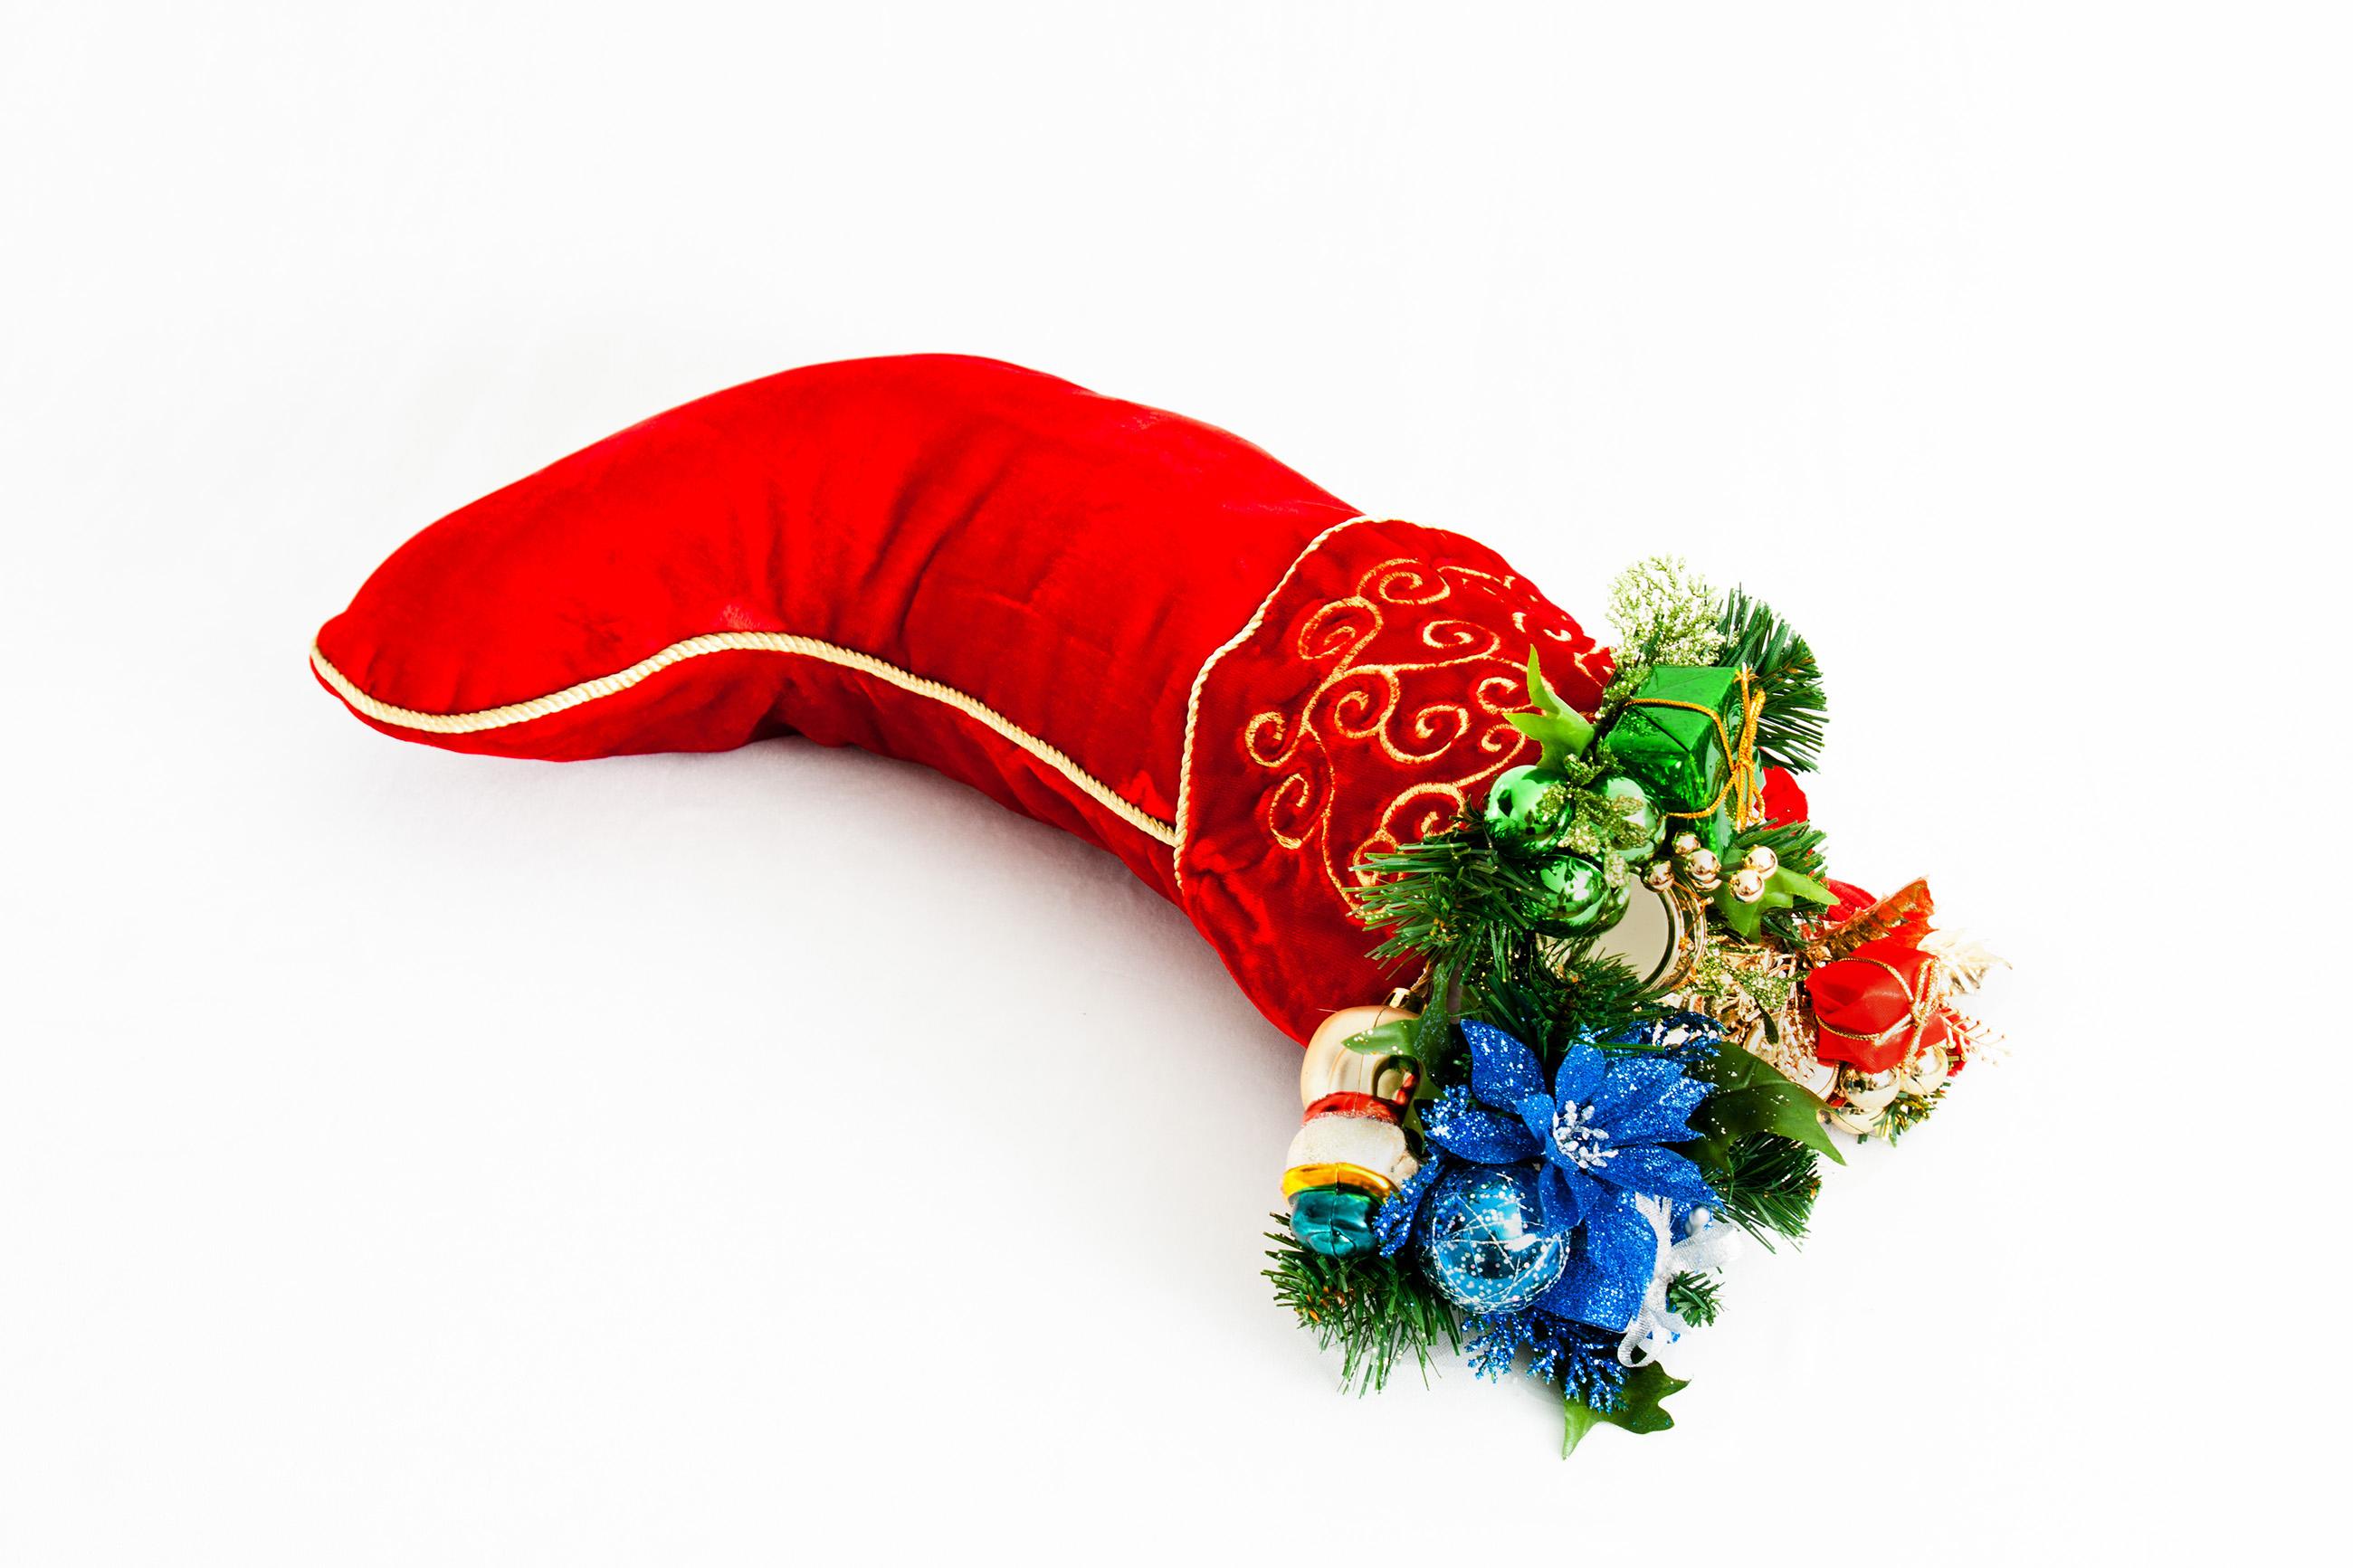 Christmas, Boot, Season, Xmas, Wrapping, HQ Photo